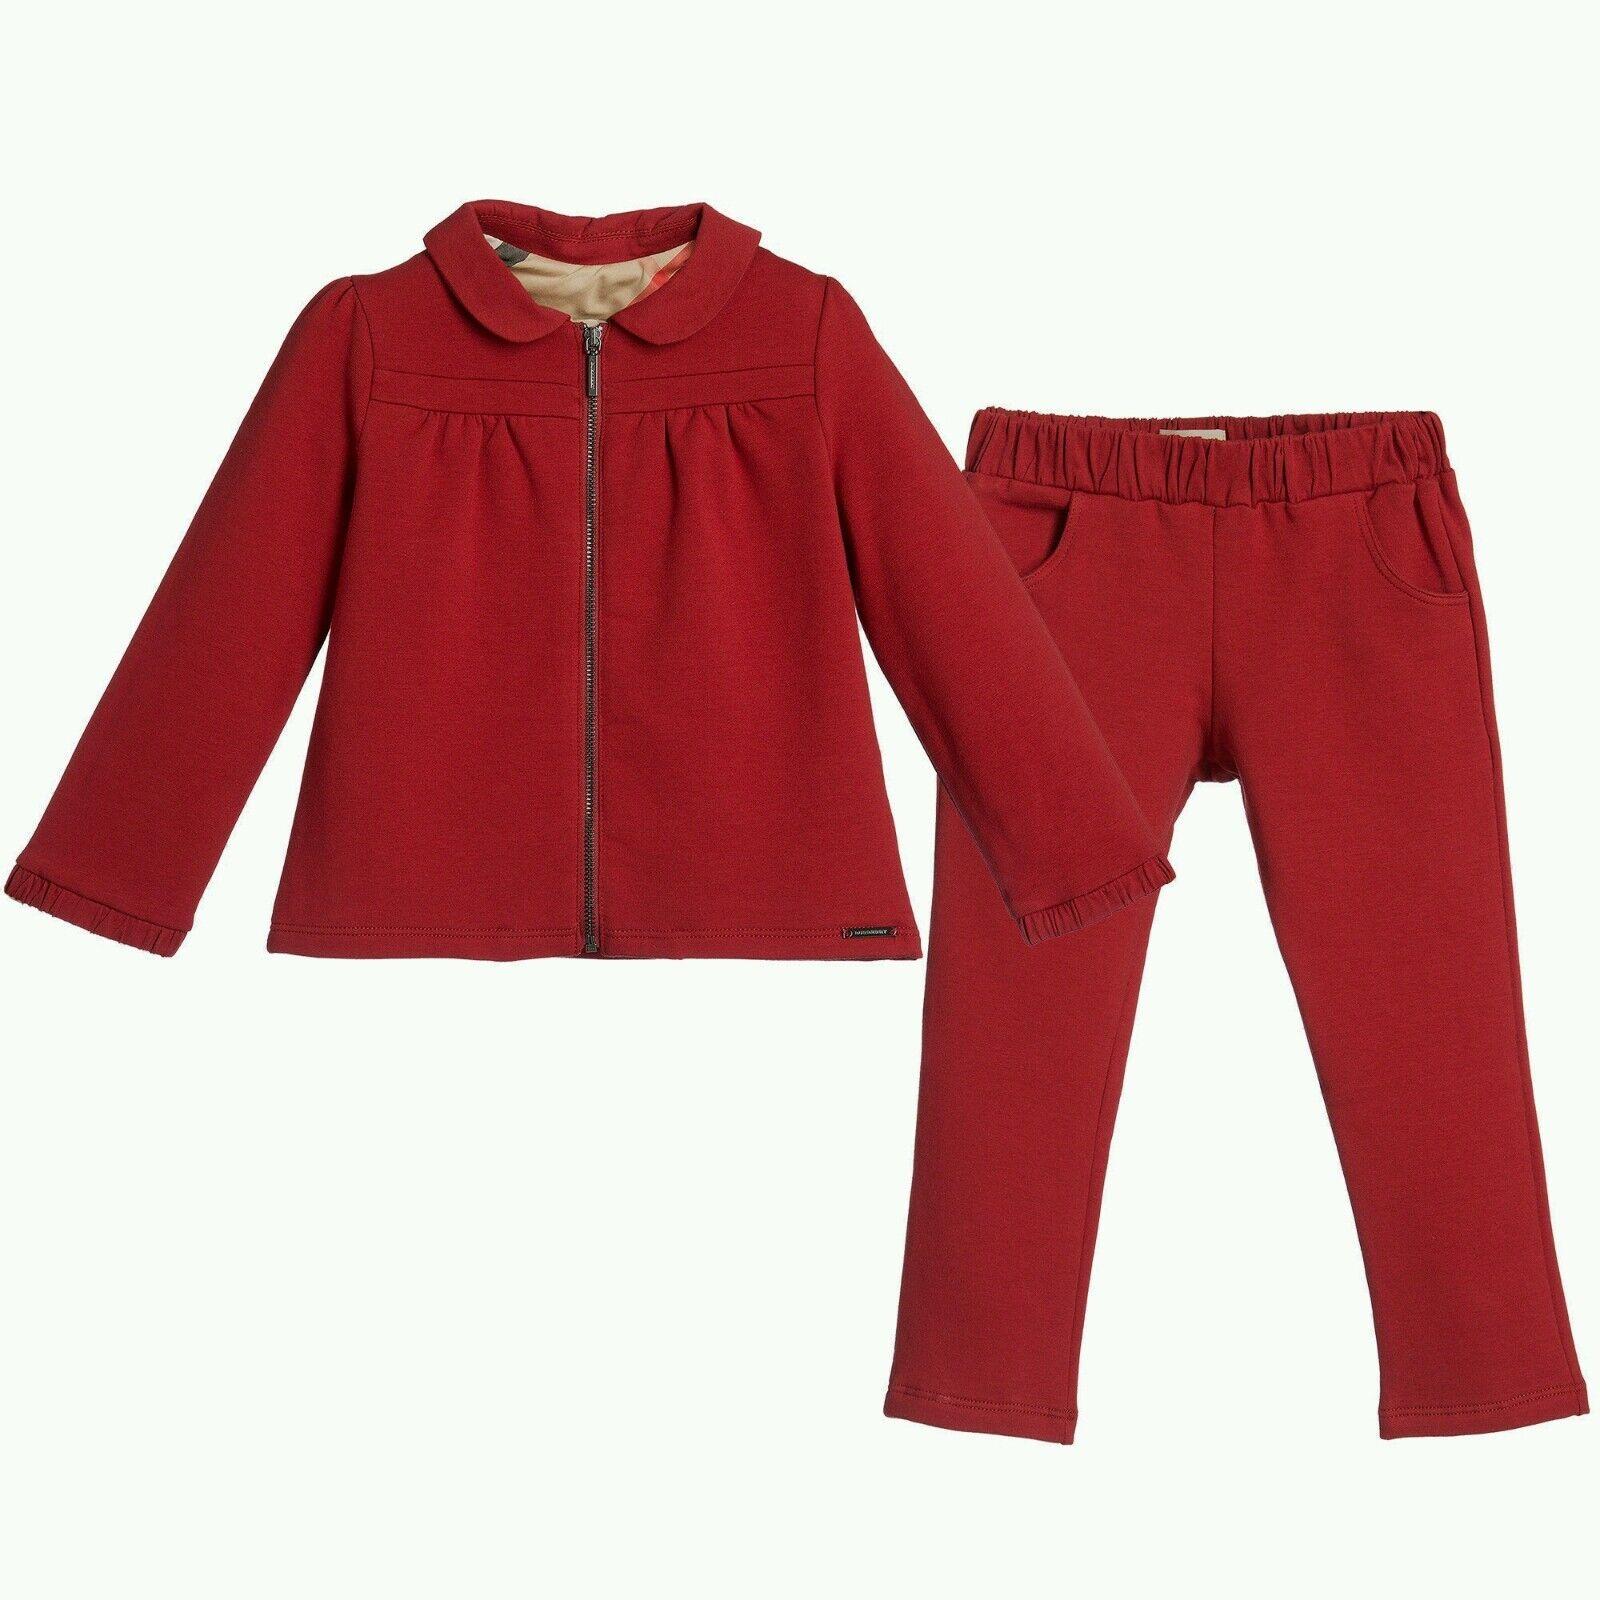 Girls Baby Clothing Baby